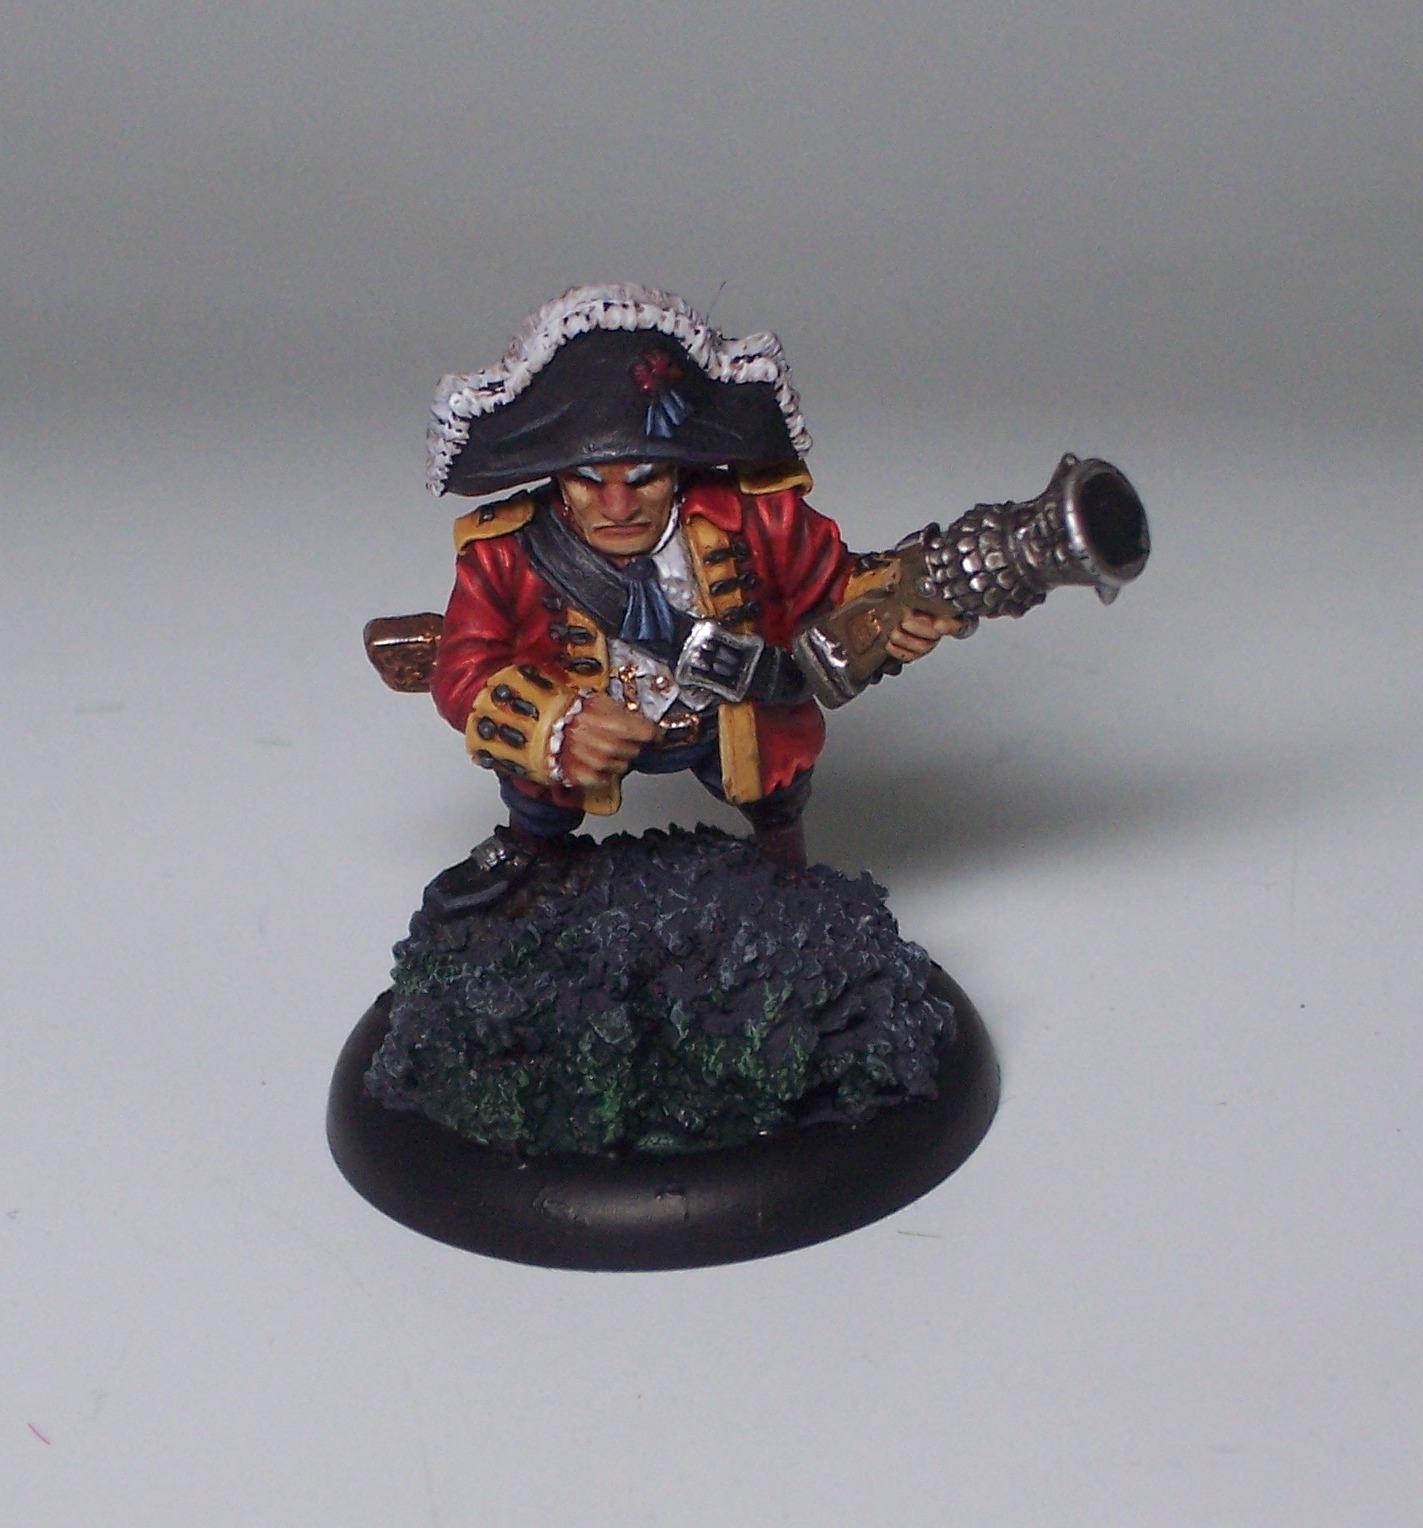 Lord Rockbottom 1